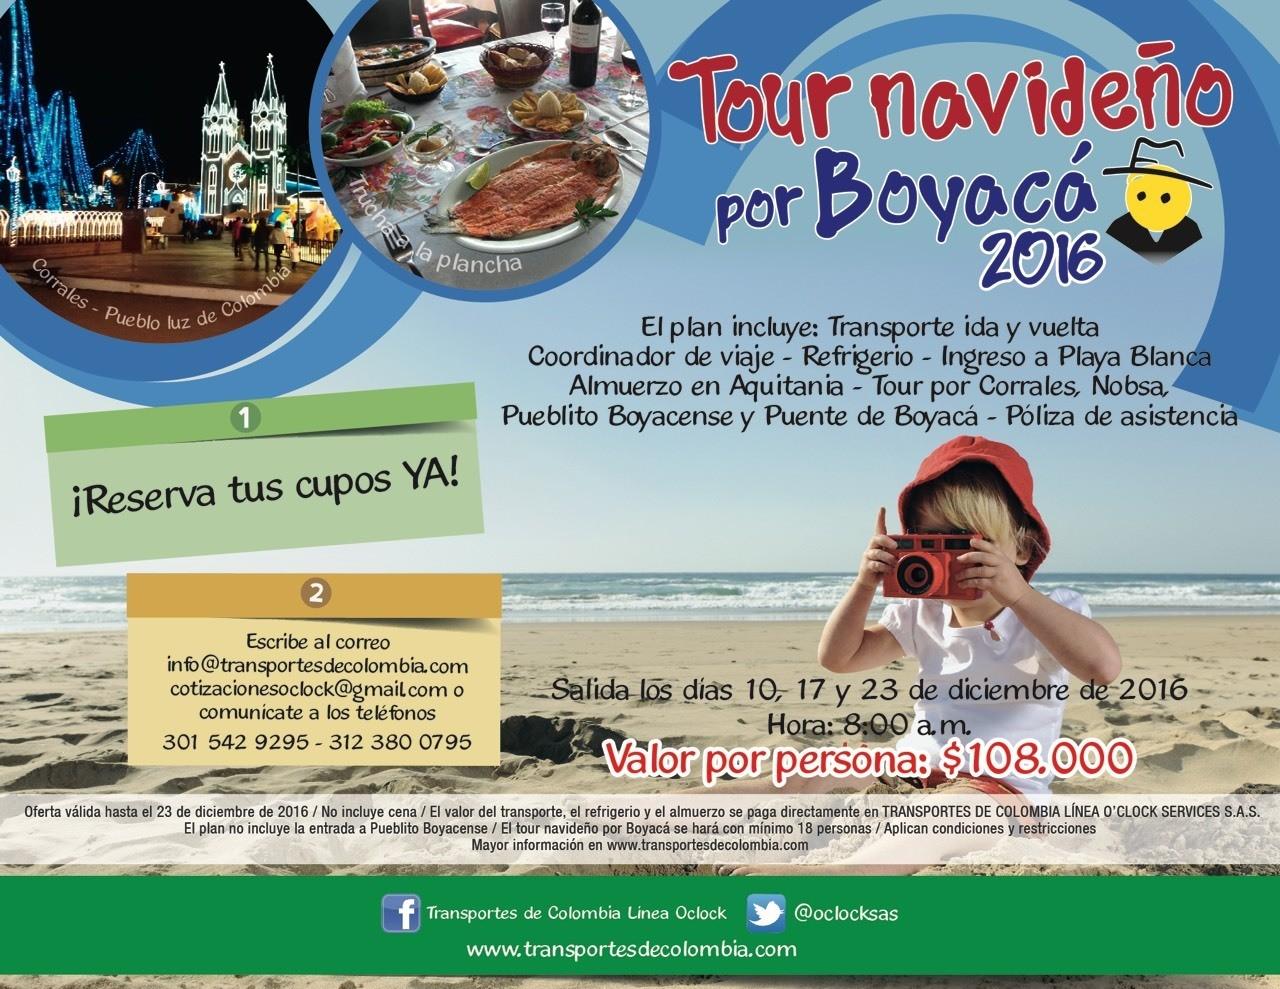 TOUR NAVIDEÑO BOYACÁ 2016